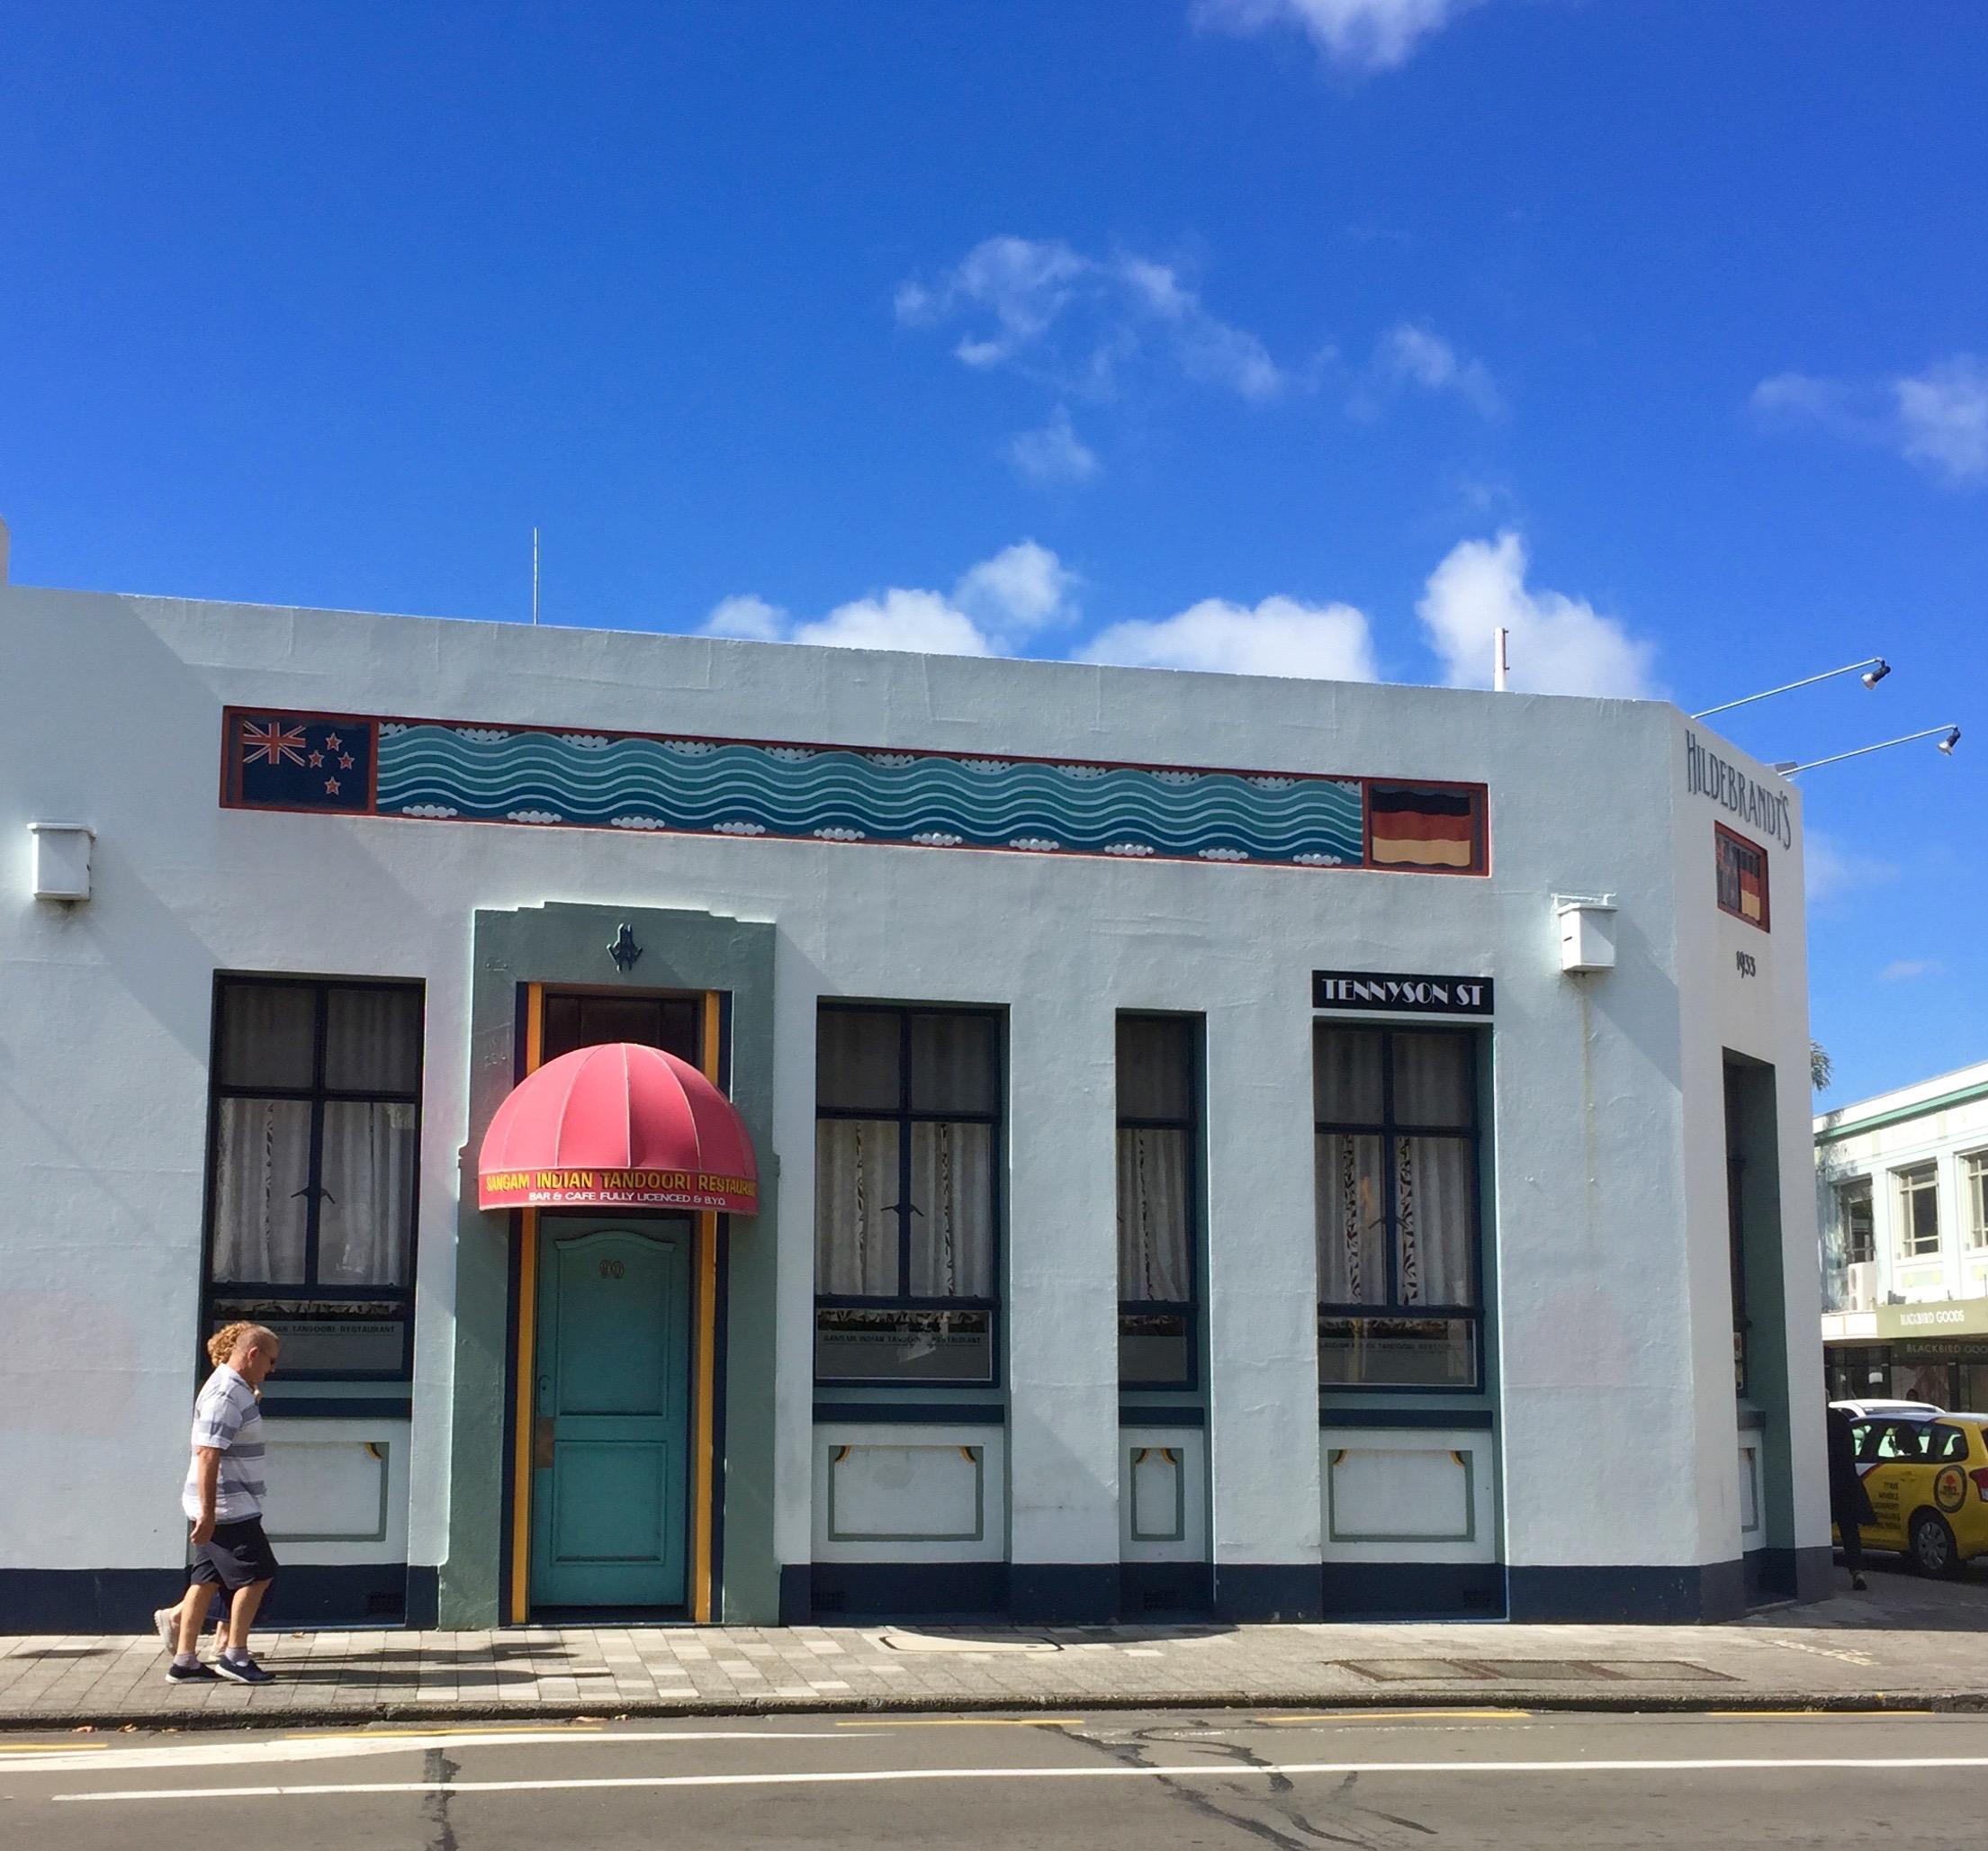 Napier Art Deco. New Zealand.